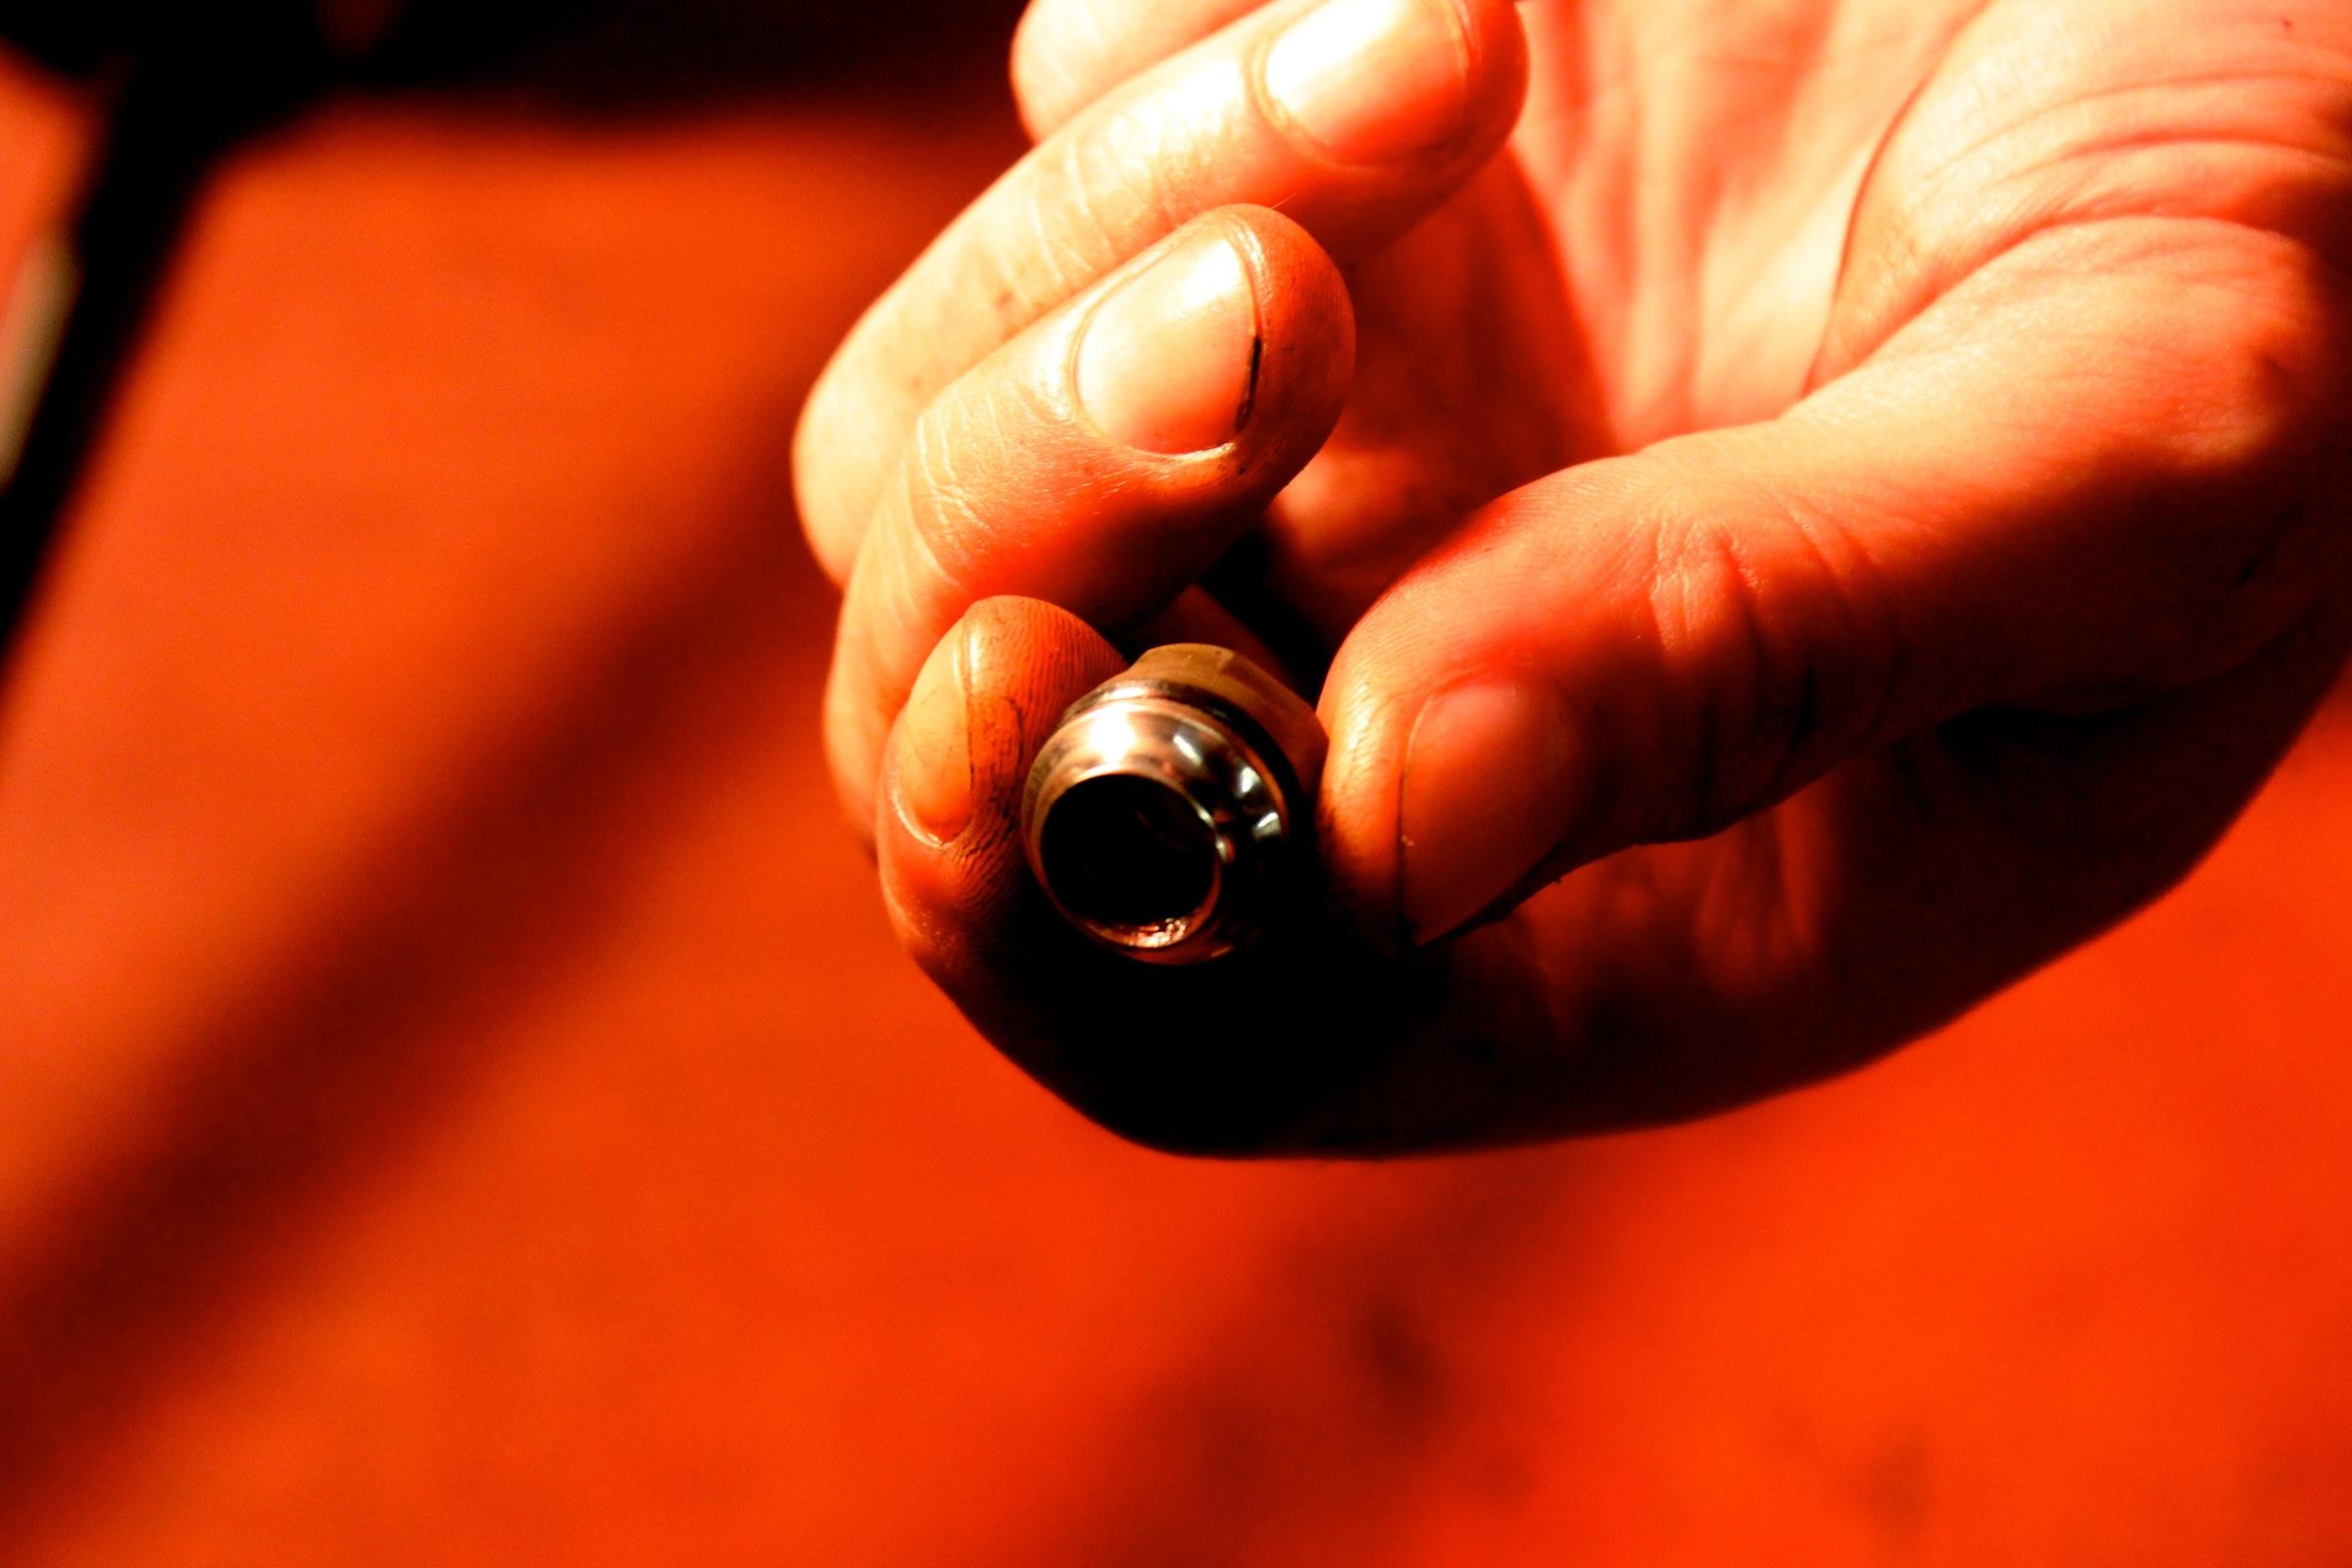 Konus gereinigt Foto: Timothy John, ©Factory Media